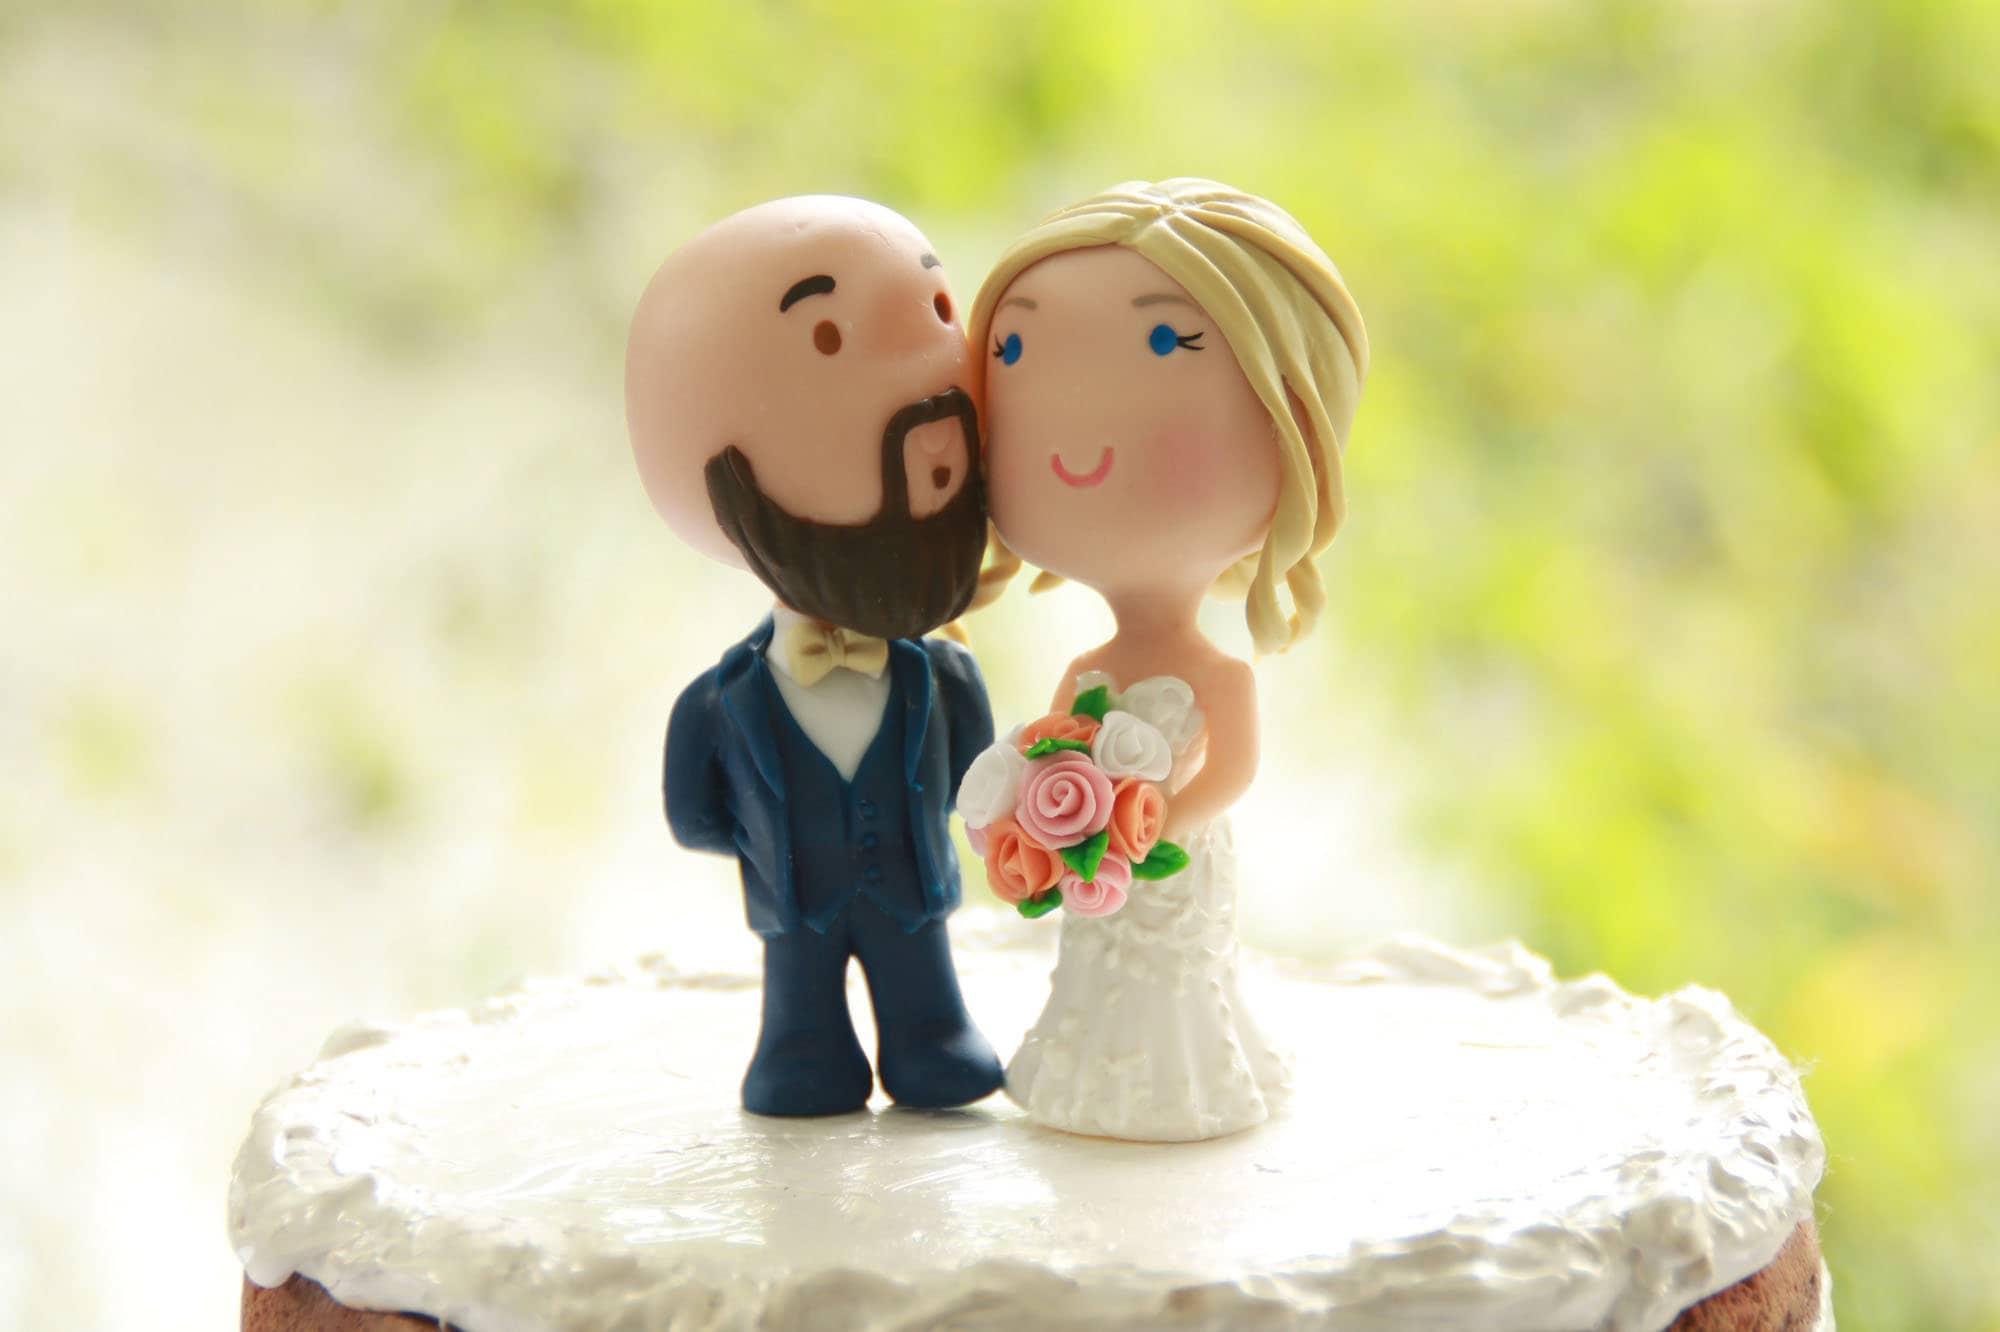 Chibi Wedding Cake Topper Bald Anime Couple Bride and Groom | Etsy